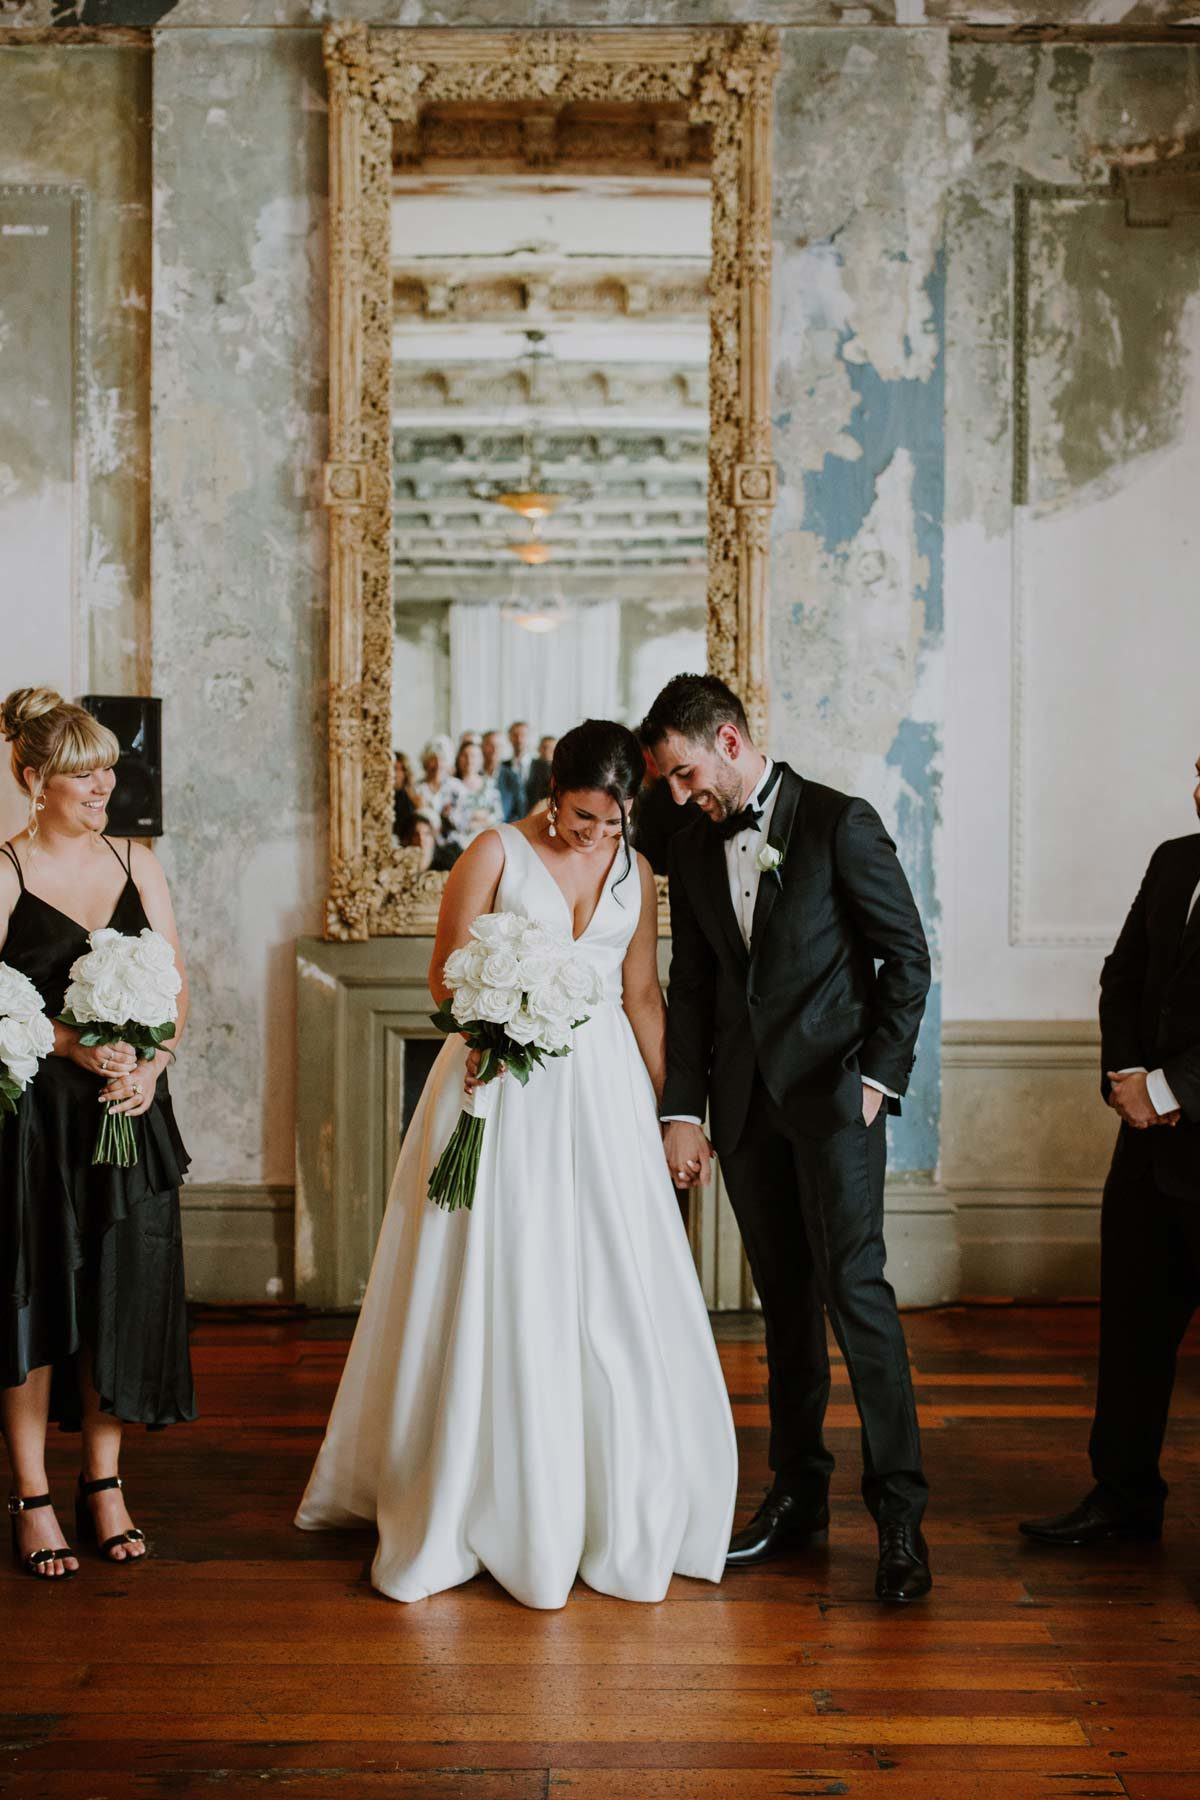 APRIL + ADAM | REAL BRIDE | REAL WEDDING | La Sposa Ralea BALLGOWN